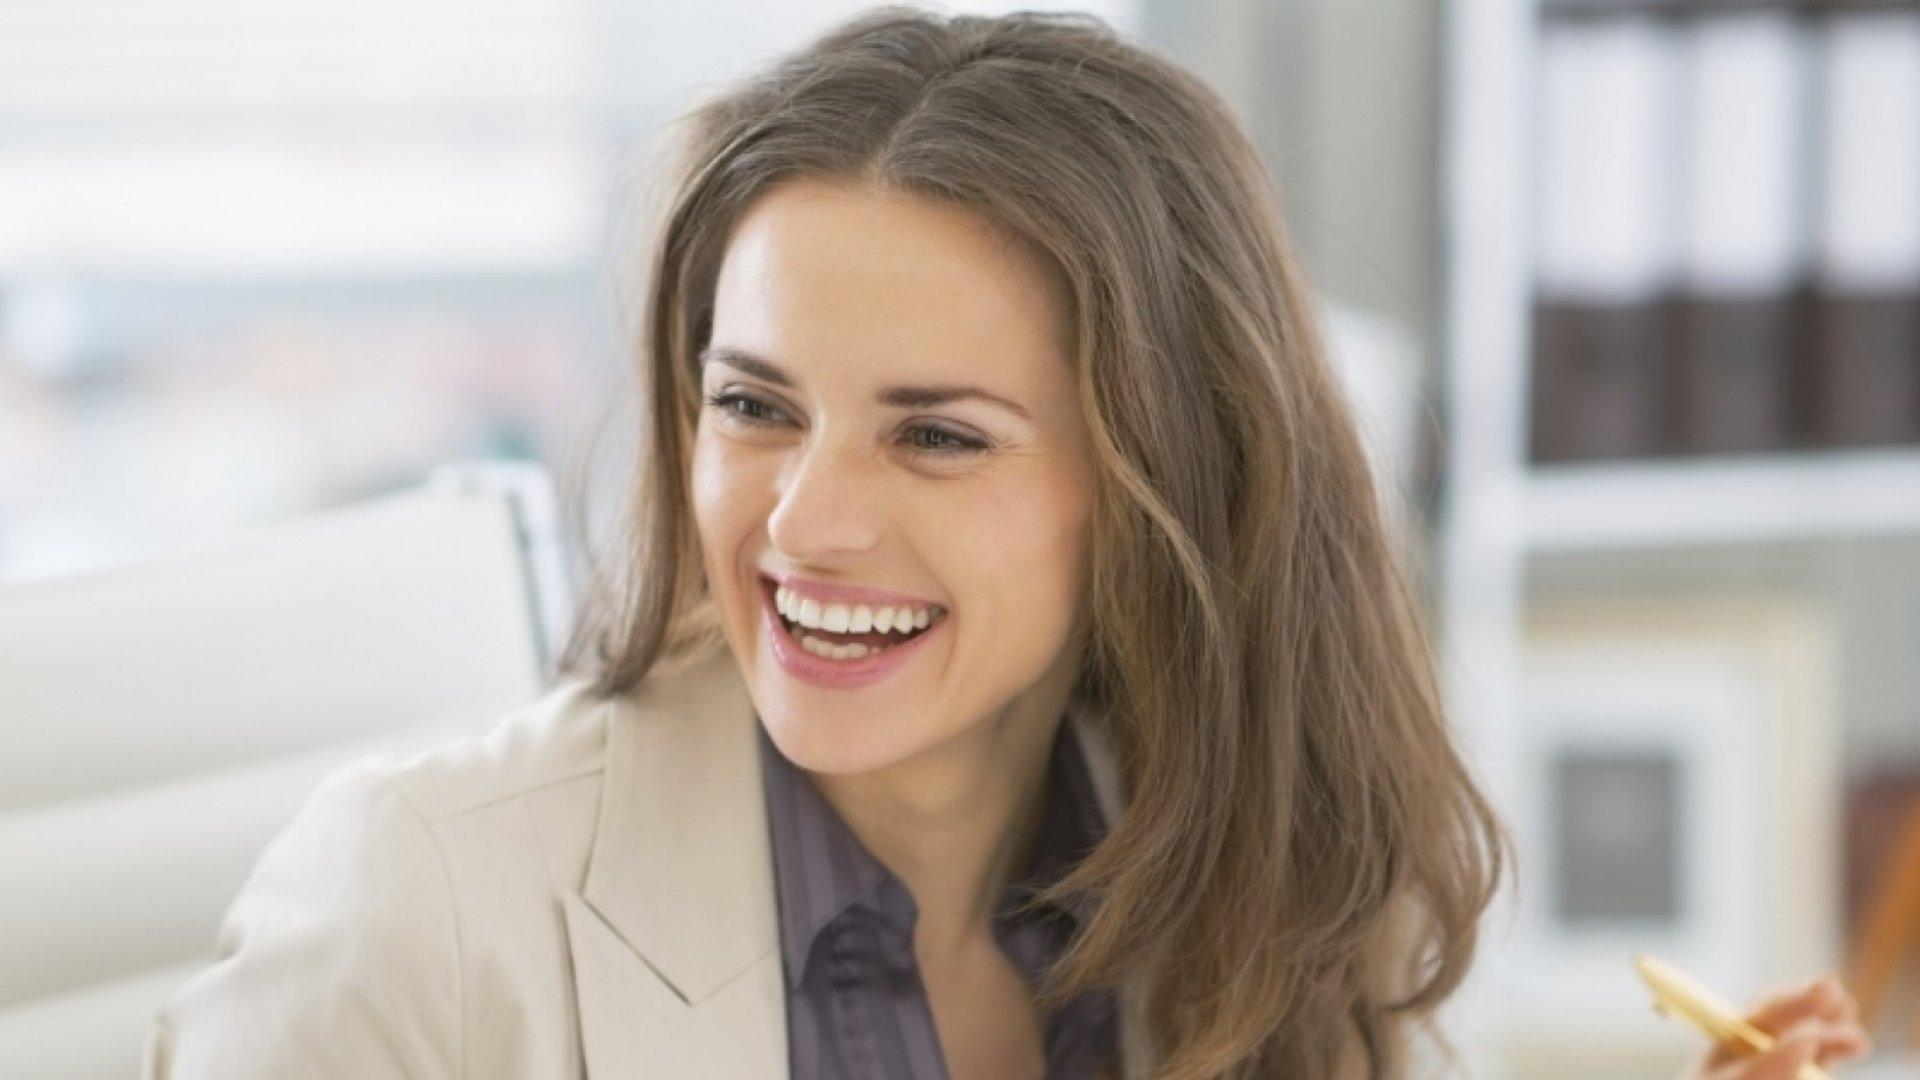 The 20 Best Cities in the World for Female Entrepreneurs